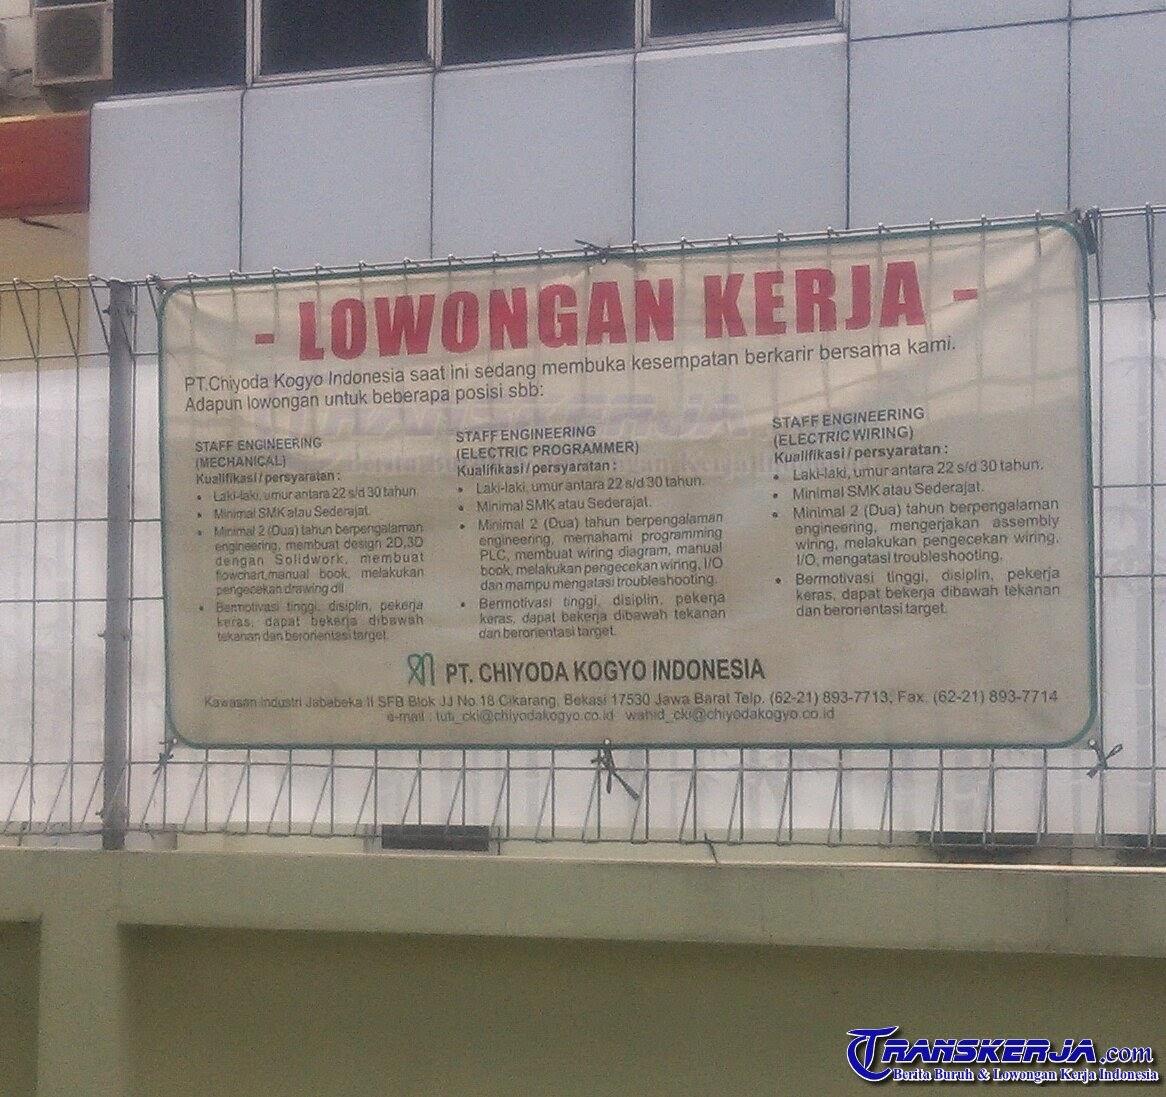 Lowongan Kerja Kawasan Jababeka 1 Daftar Alamat Perusahaan Kawasan Jababeka Mm2100 Ejip Lowongan Kerja Terbaru Pt Chiyoda Kogyo Indonesia Jababeka Ii